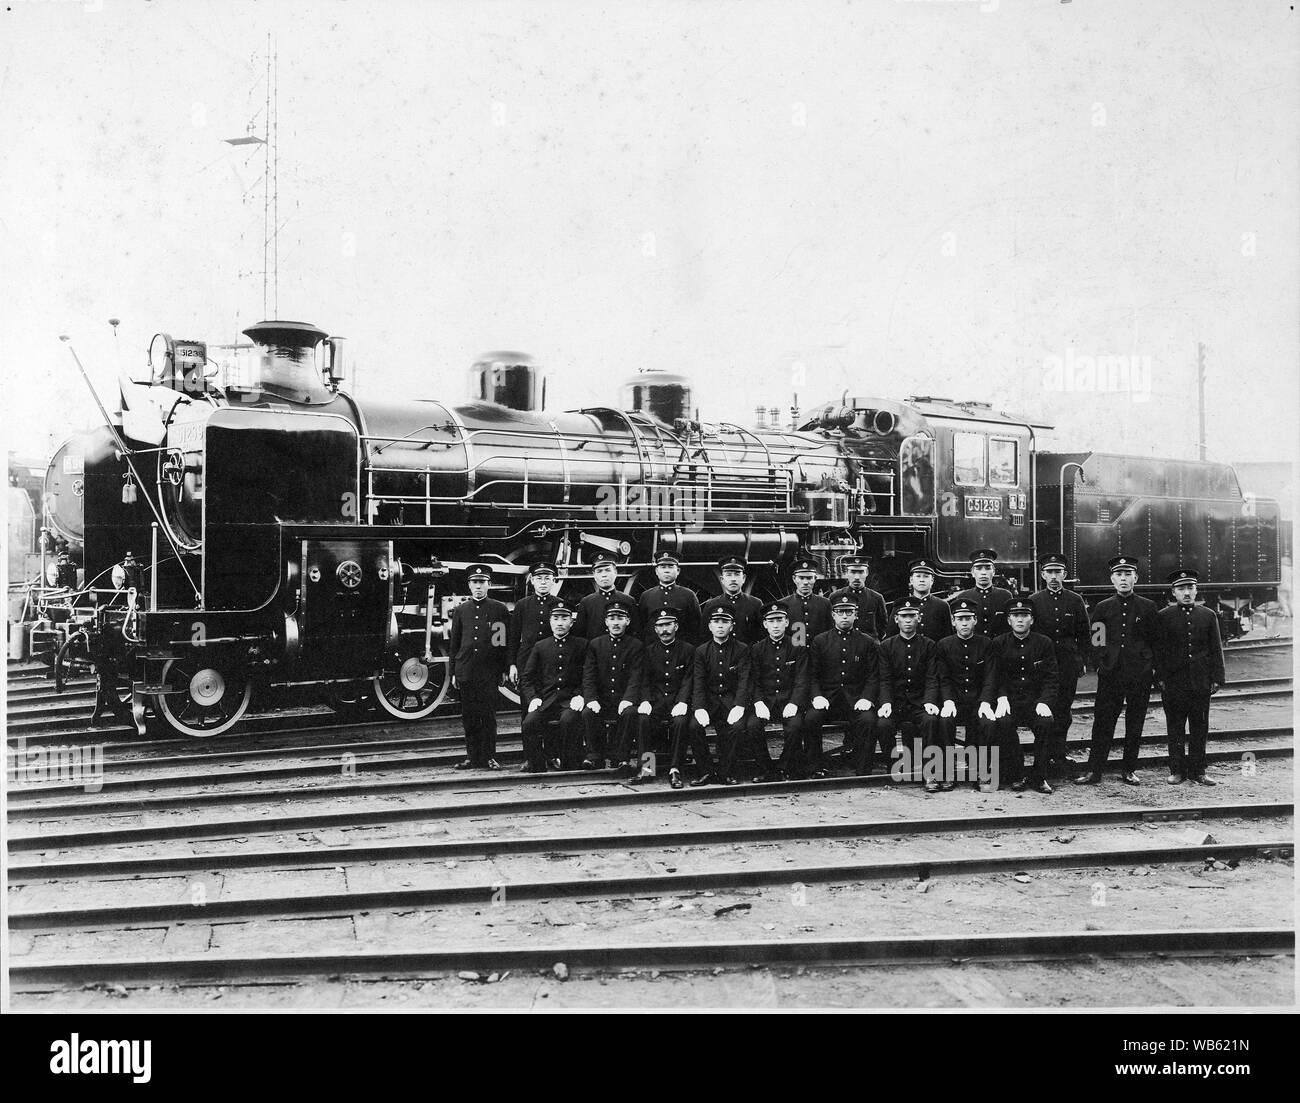 Vintage Steam Train Print Stock Photos Vintage Steam Train Print